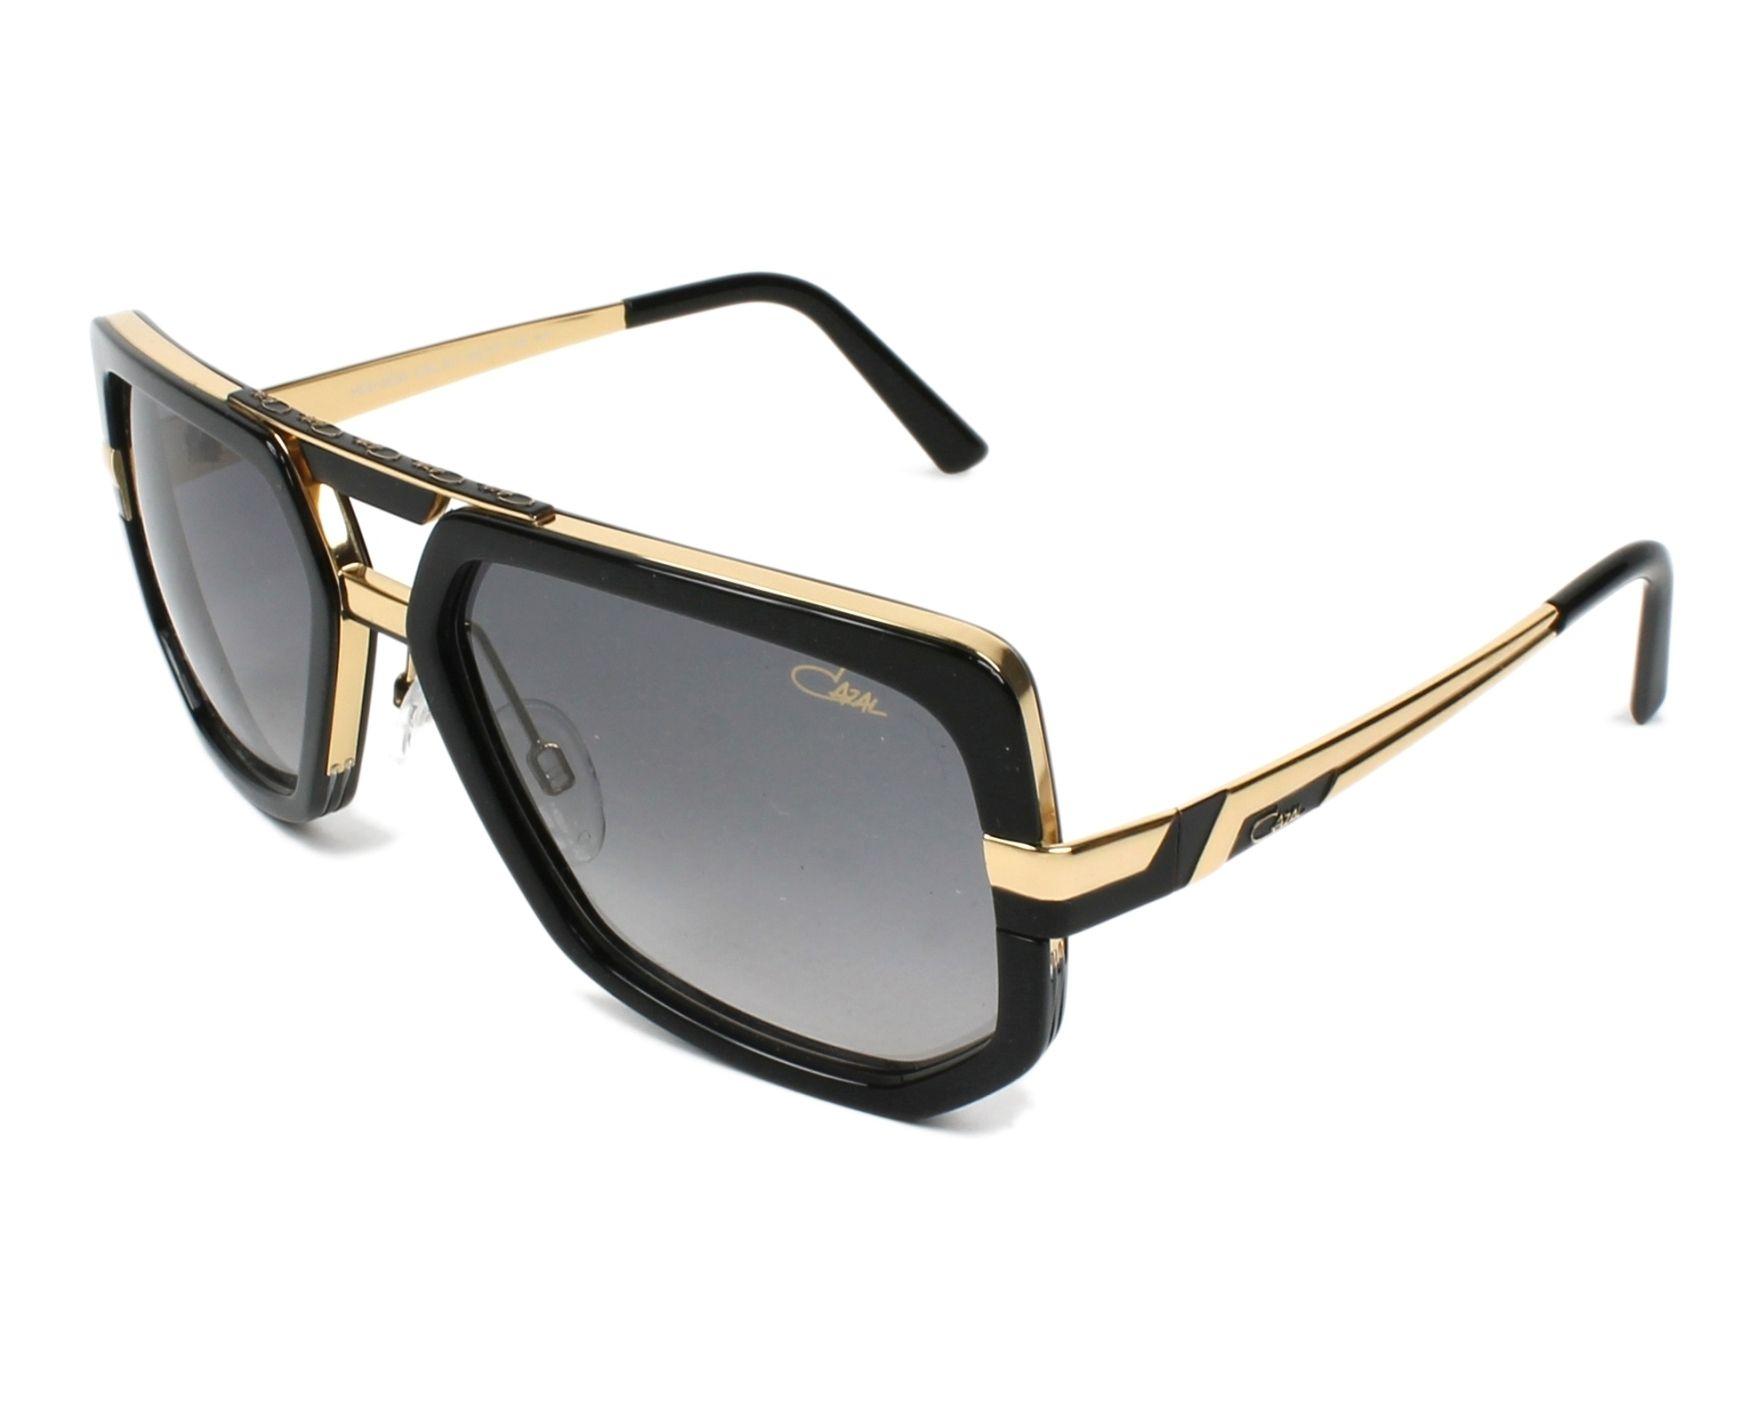 Cazal Sunglasses Black with Grey Lenses 662-3 001 ...